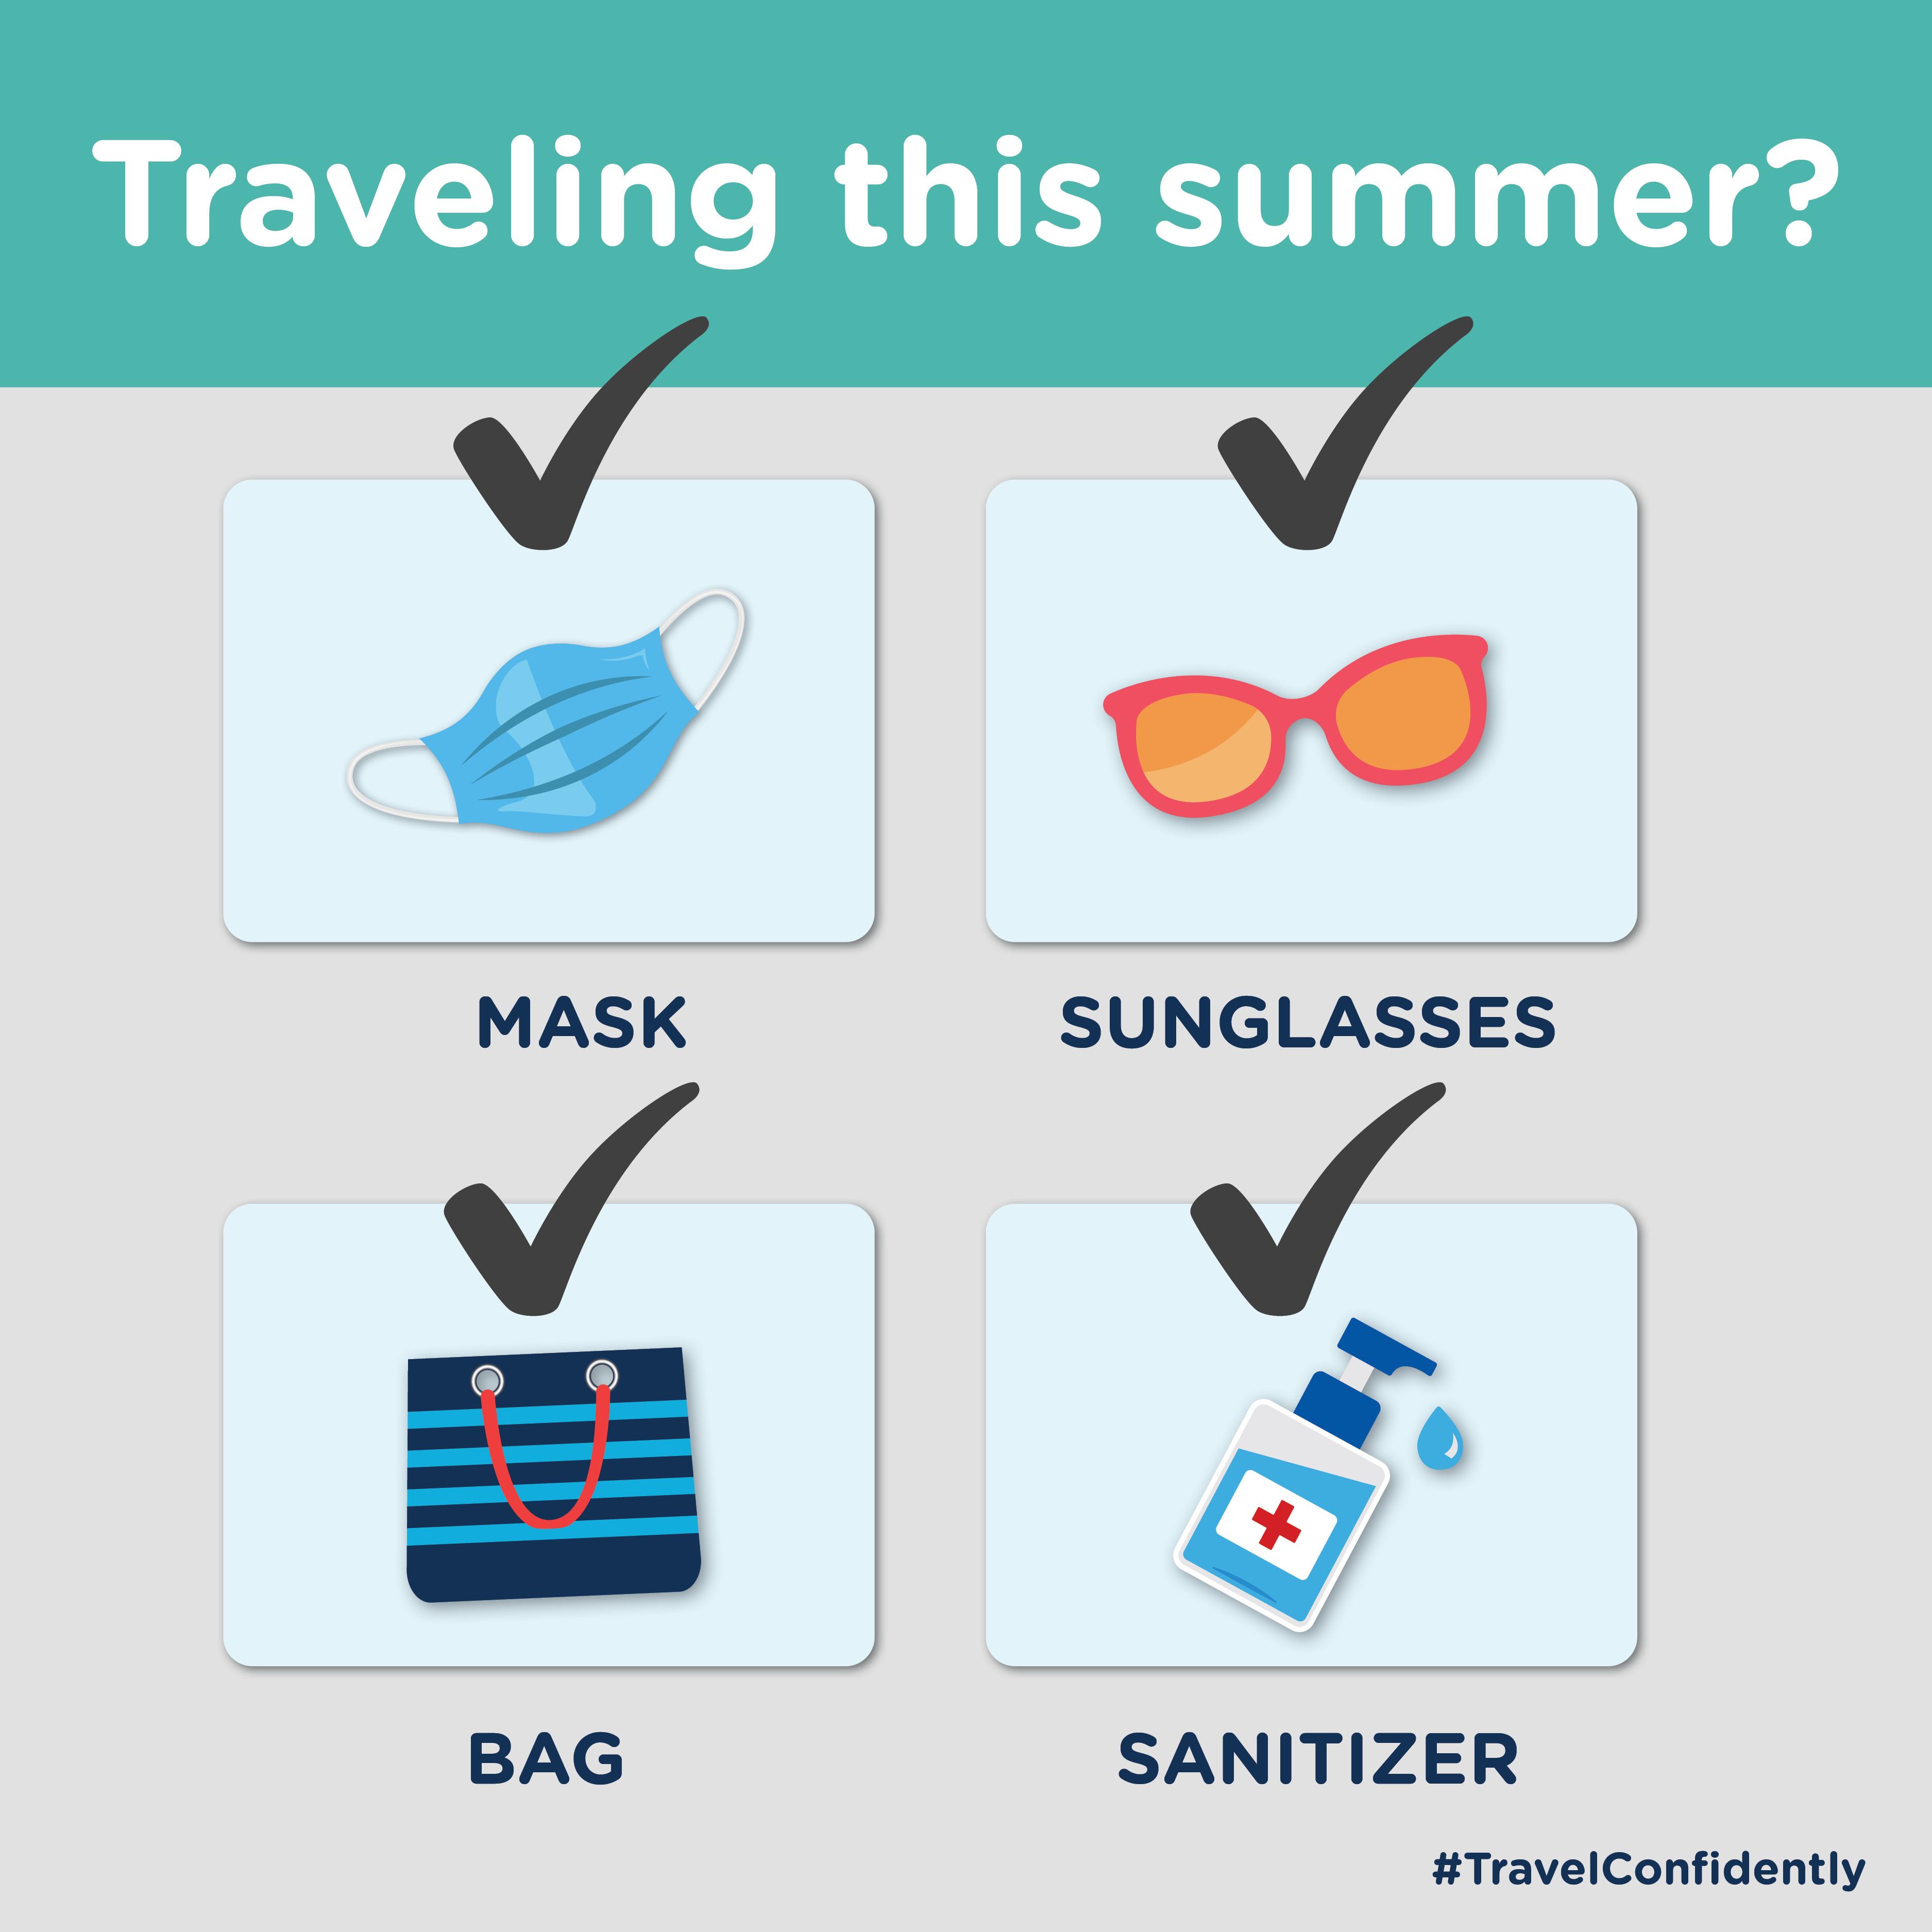 Travel Confidently Summer